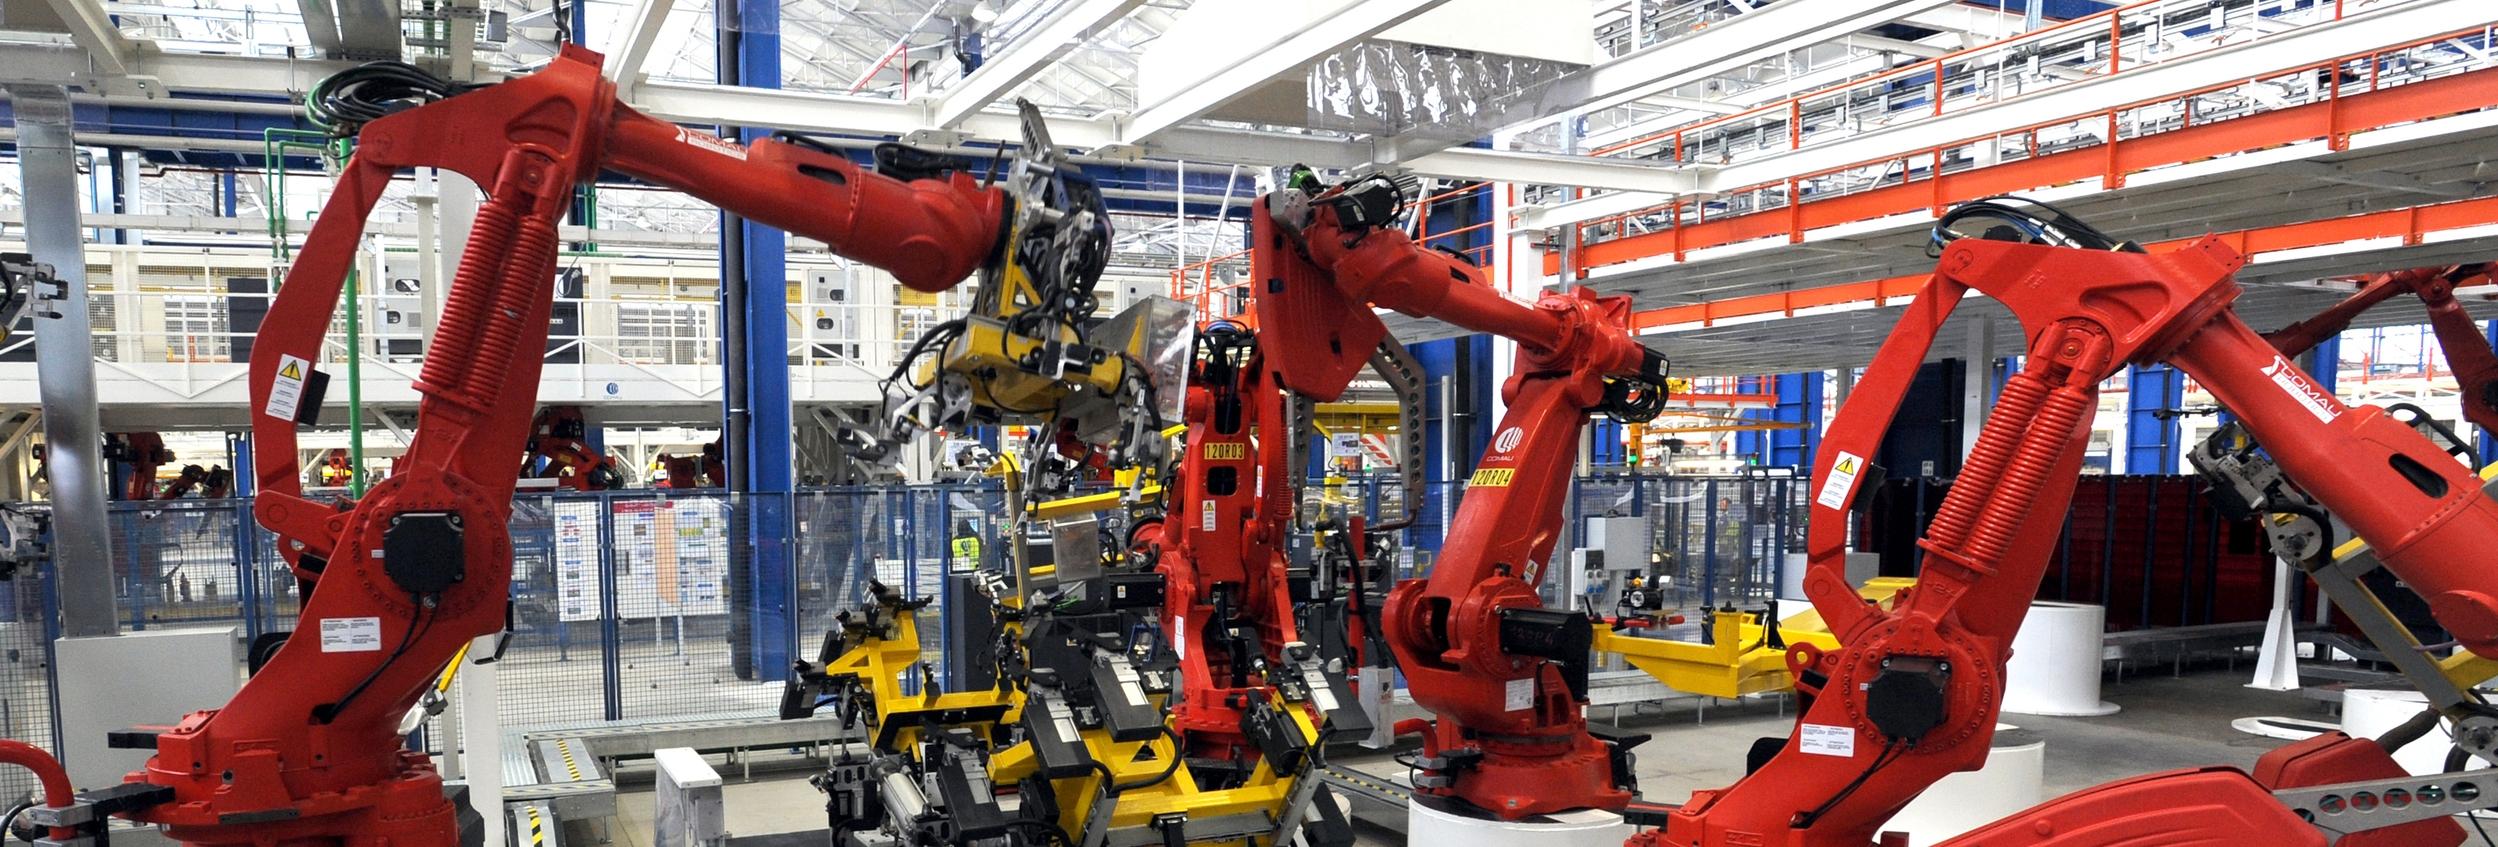 Atronix Engineering, industries, manufacturing, car plant, atronixengineering.com